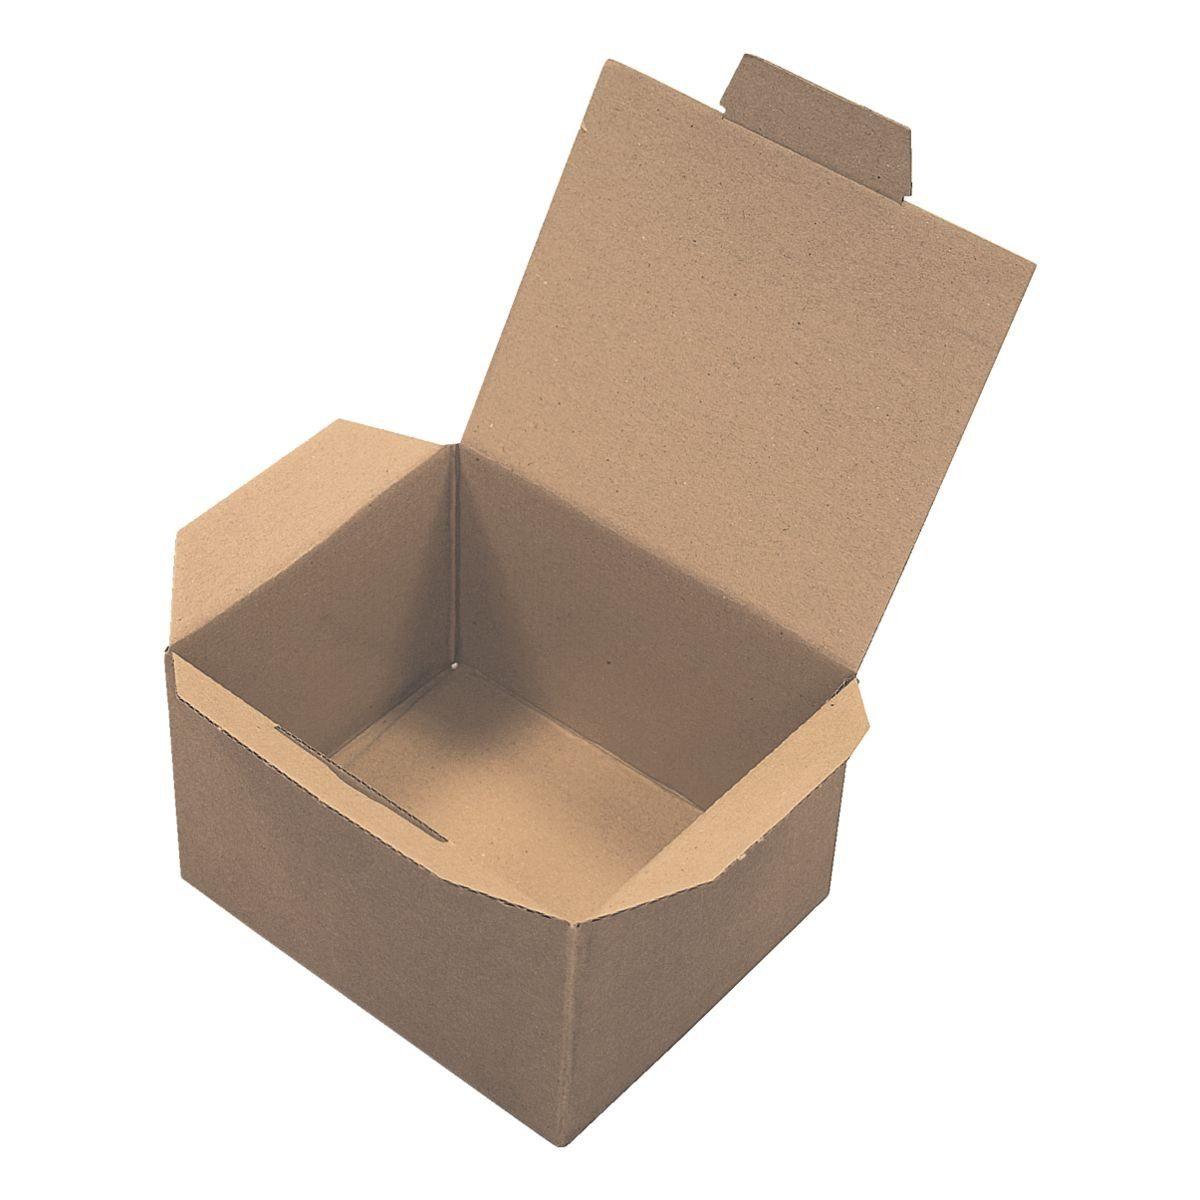 Quali Well Mehrzweckkartons mit Klappdeckel 14,2/11,7/8,4 cm